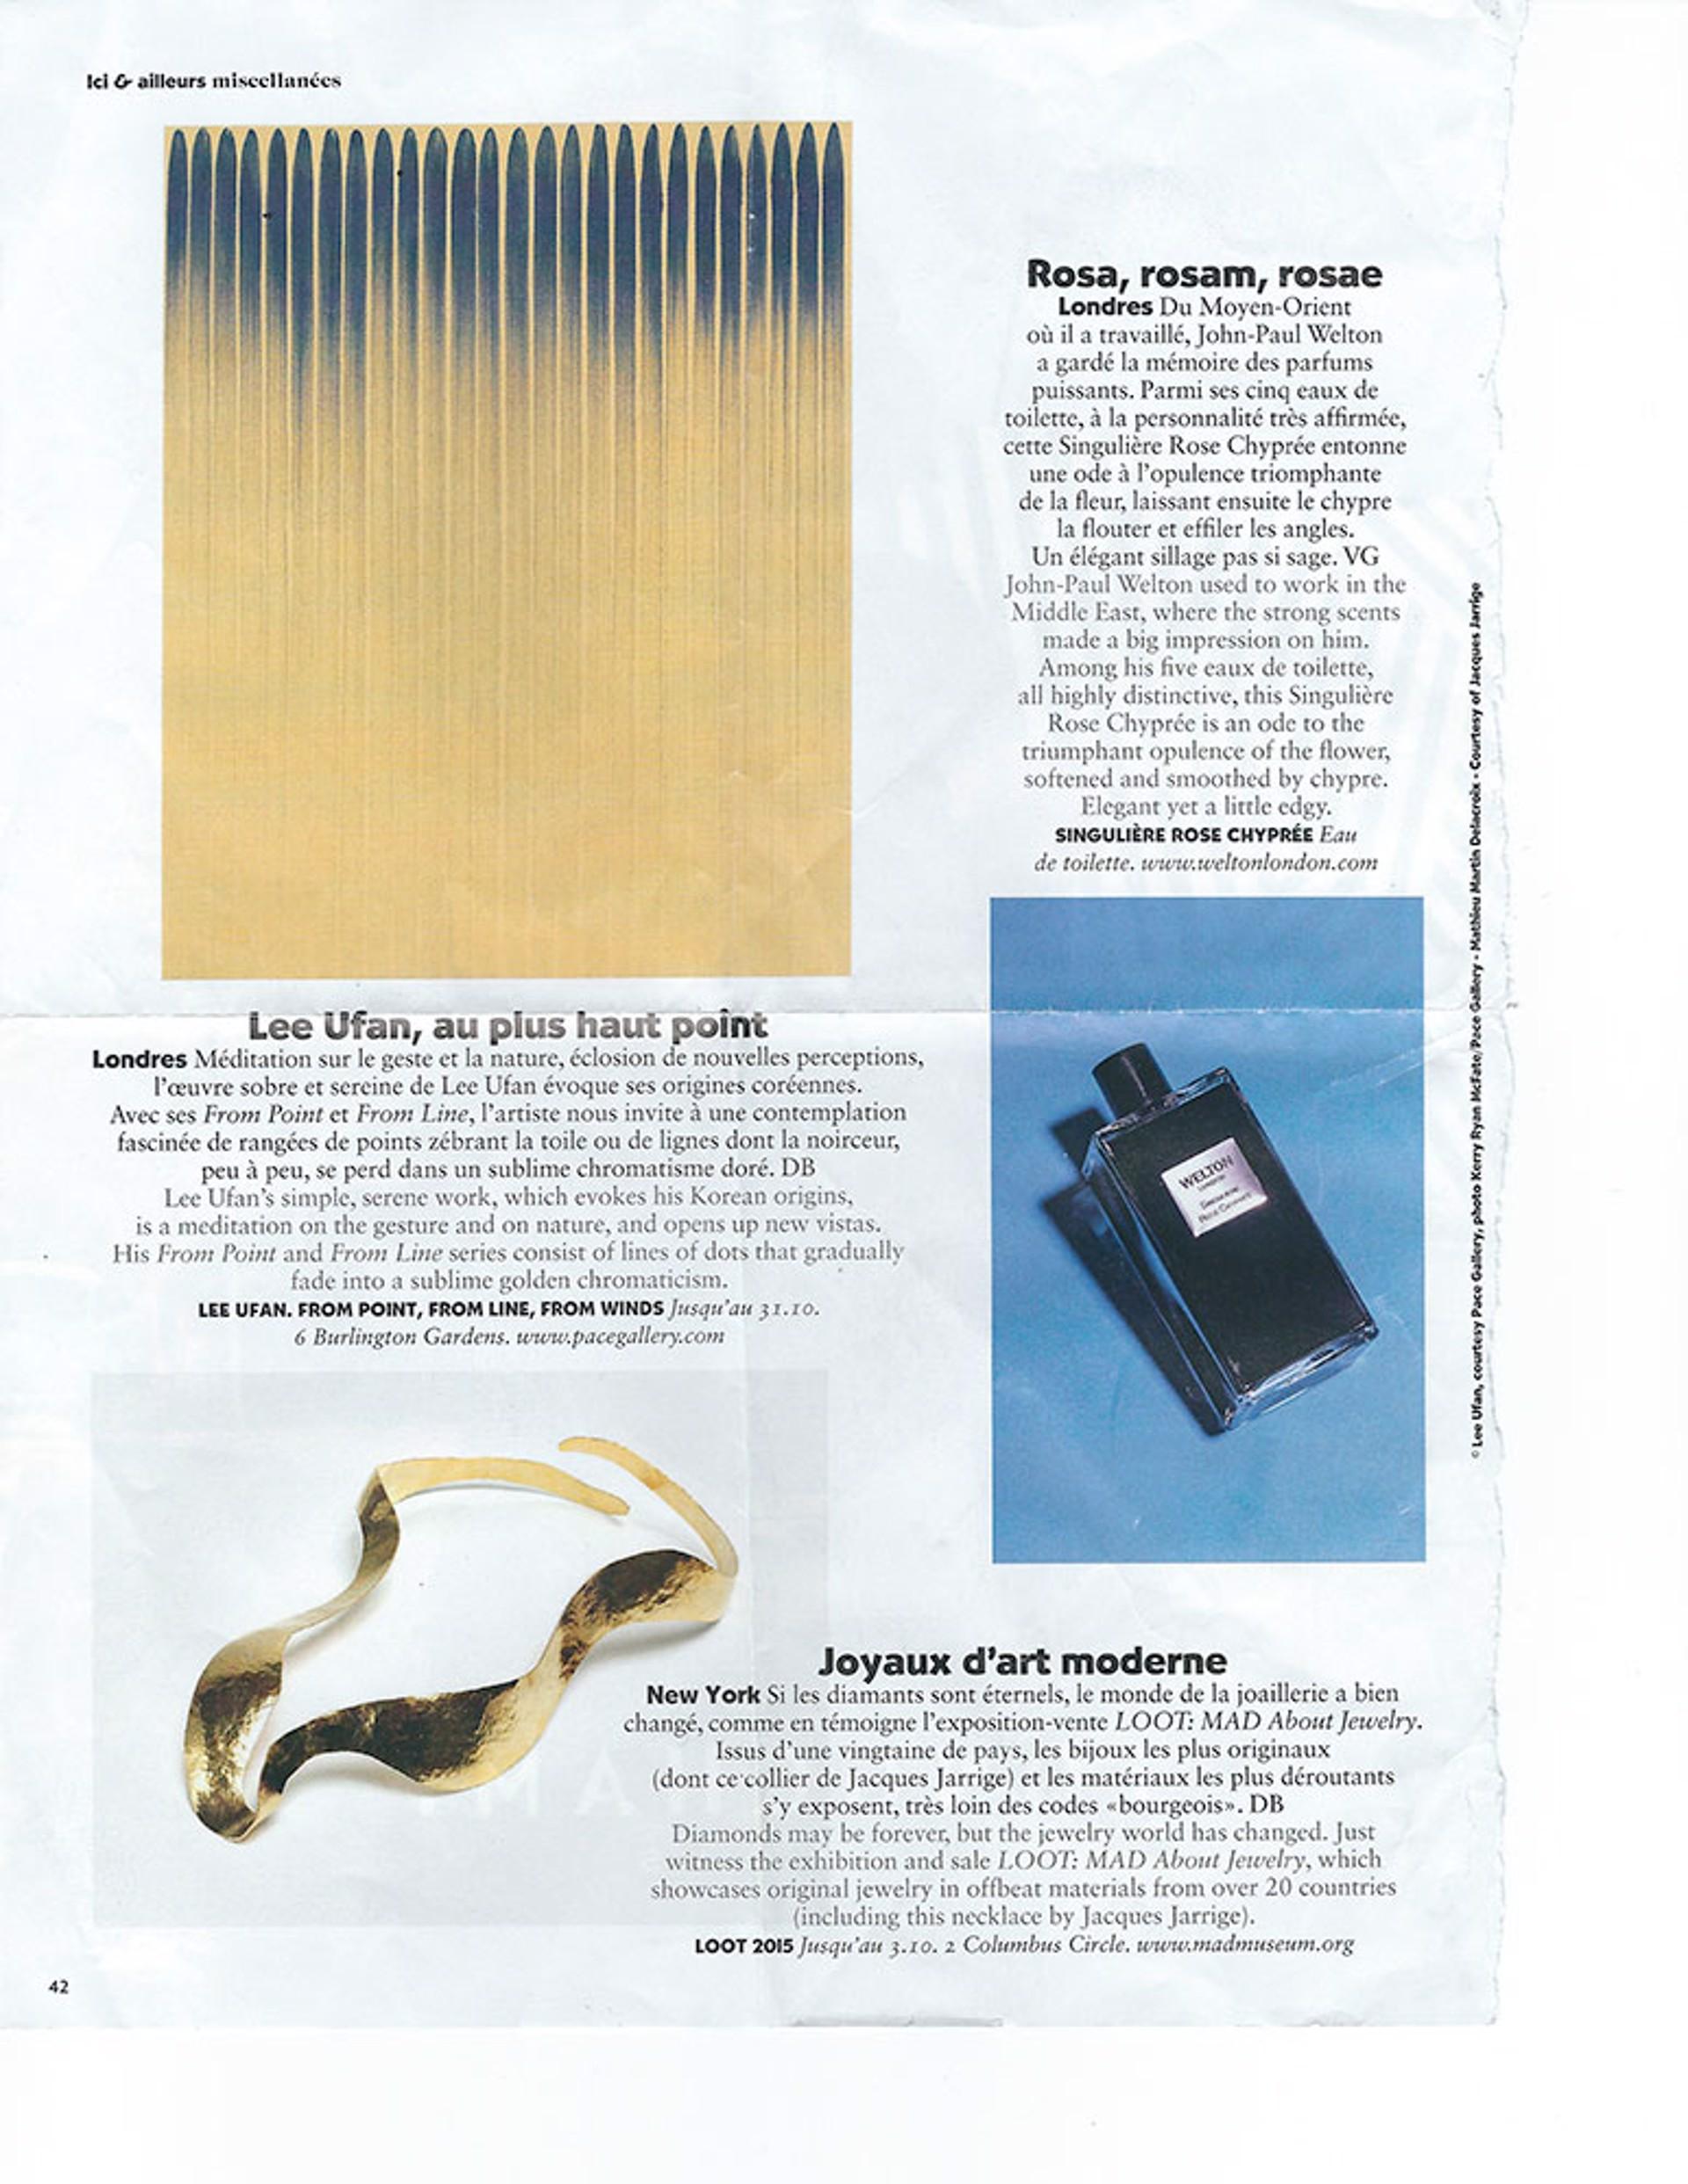 Air France Magazine, November 2015 - Jacques Jarrige